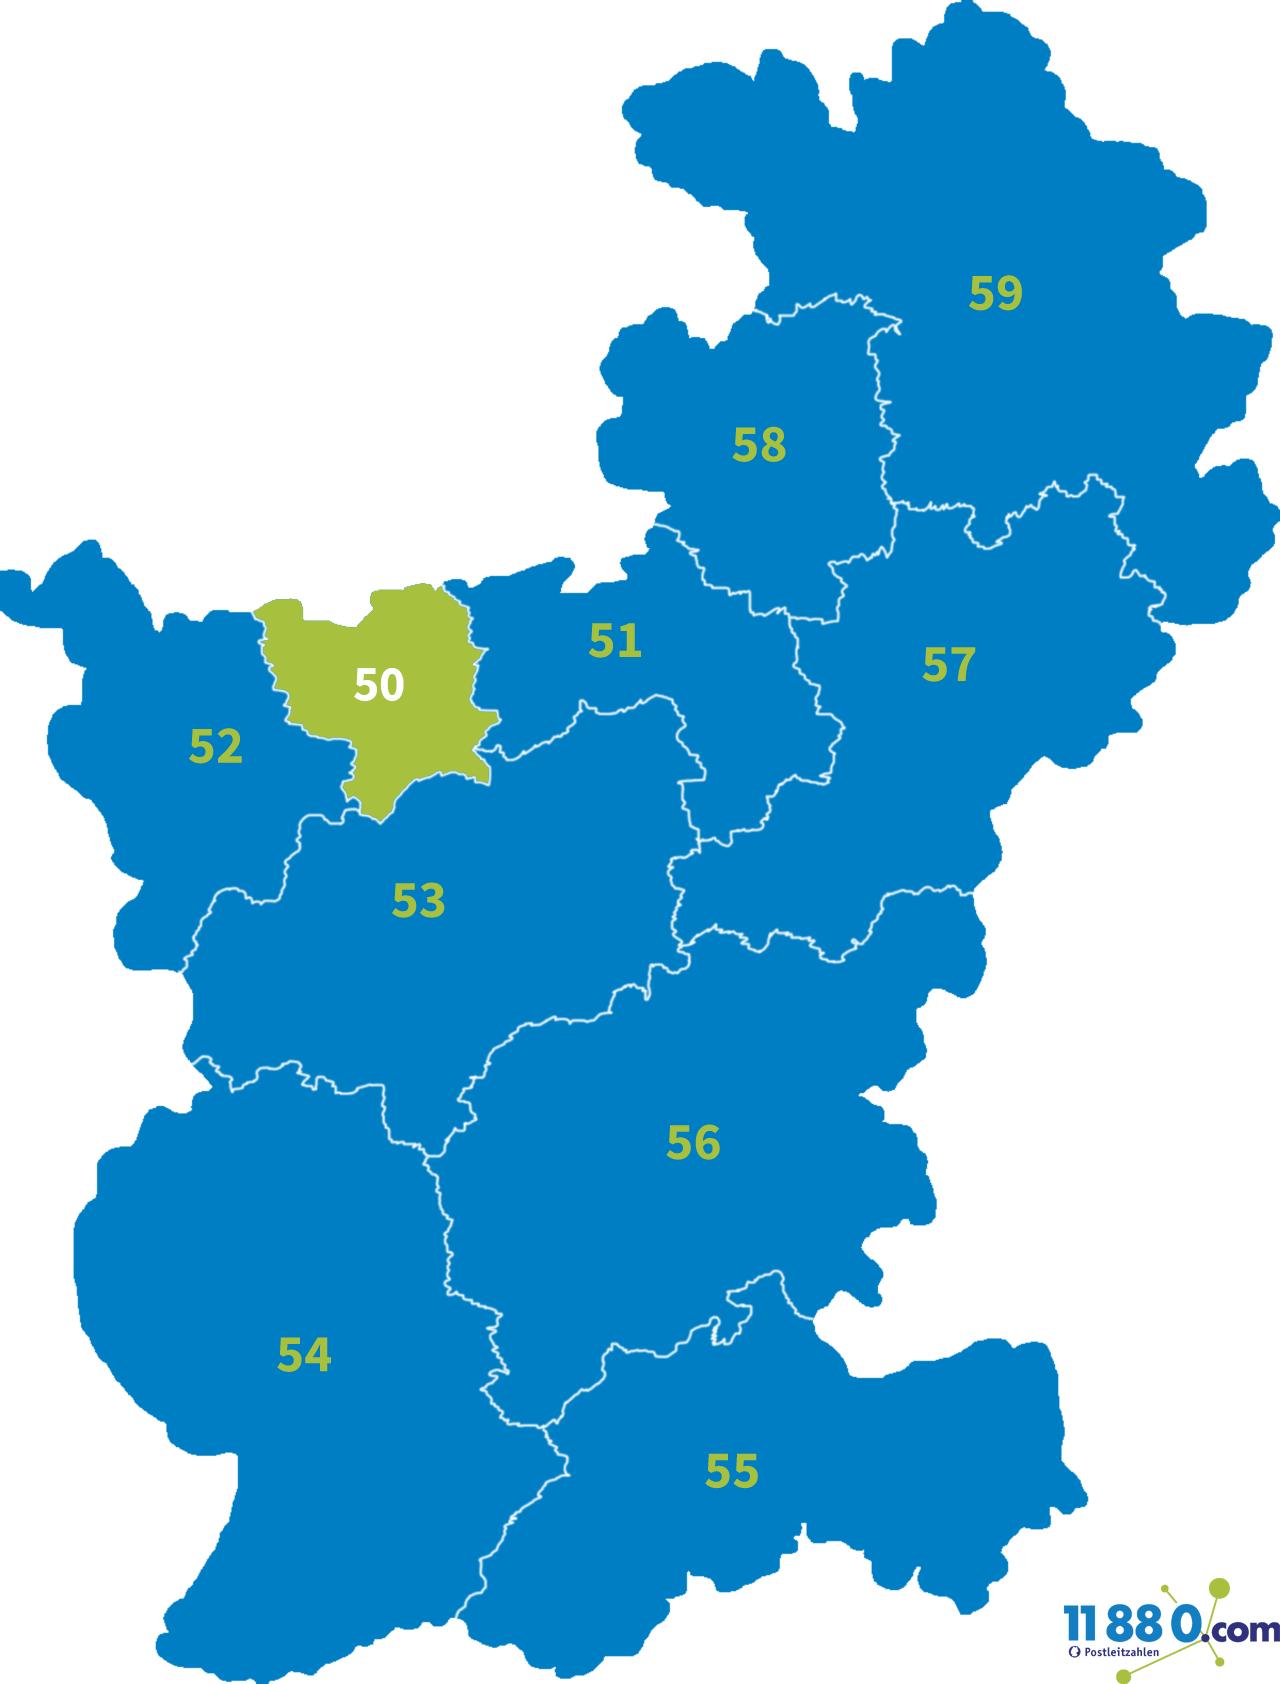 PLZ 50 - Postleitzahl Bereich 50 » postleitzahlen.de